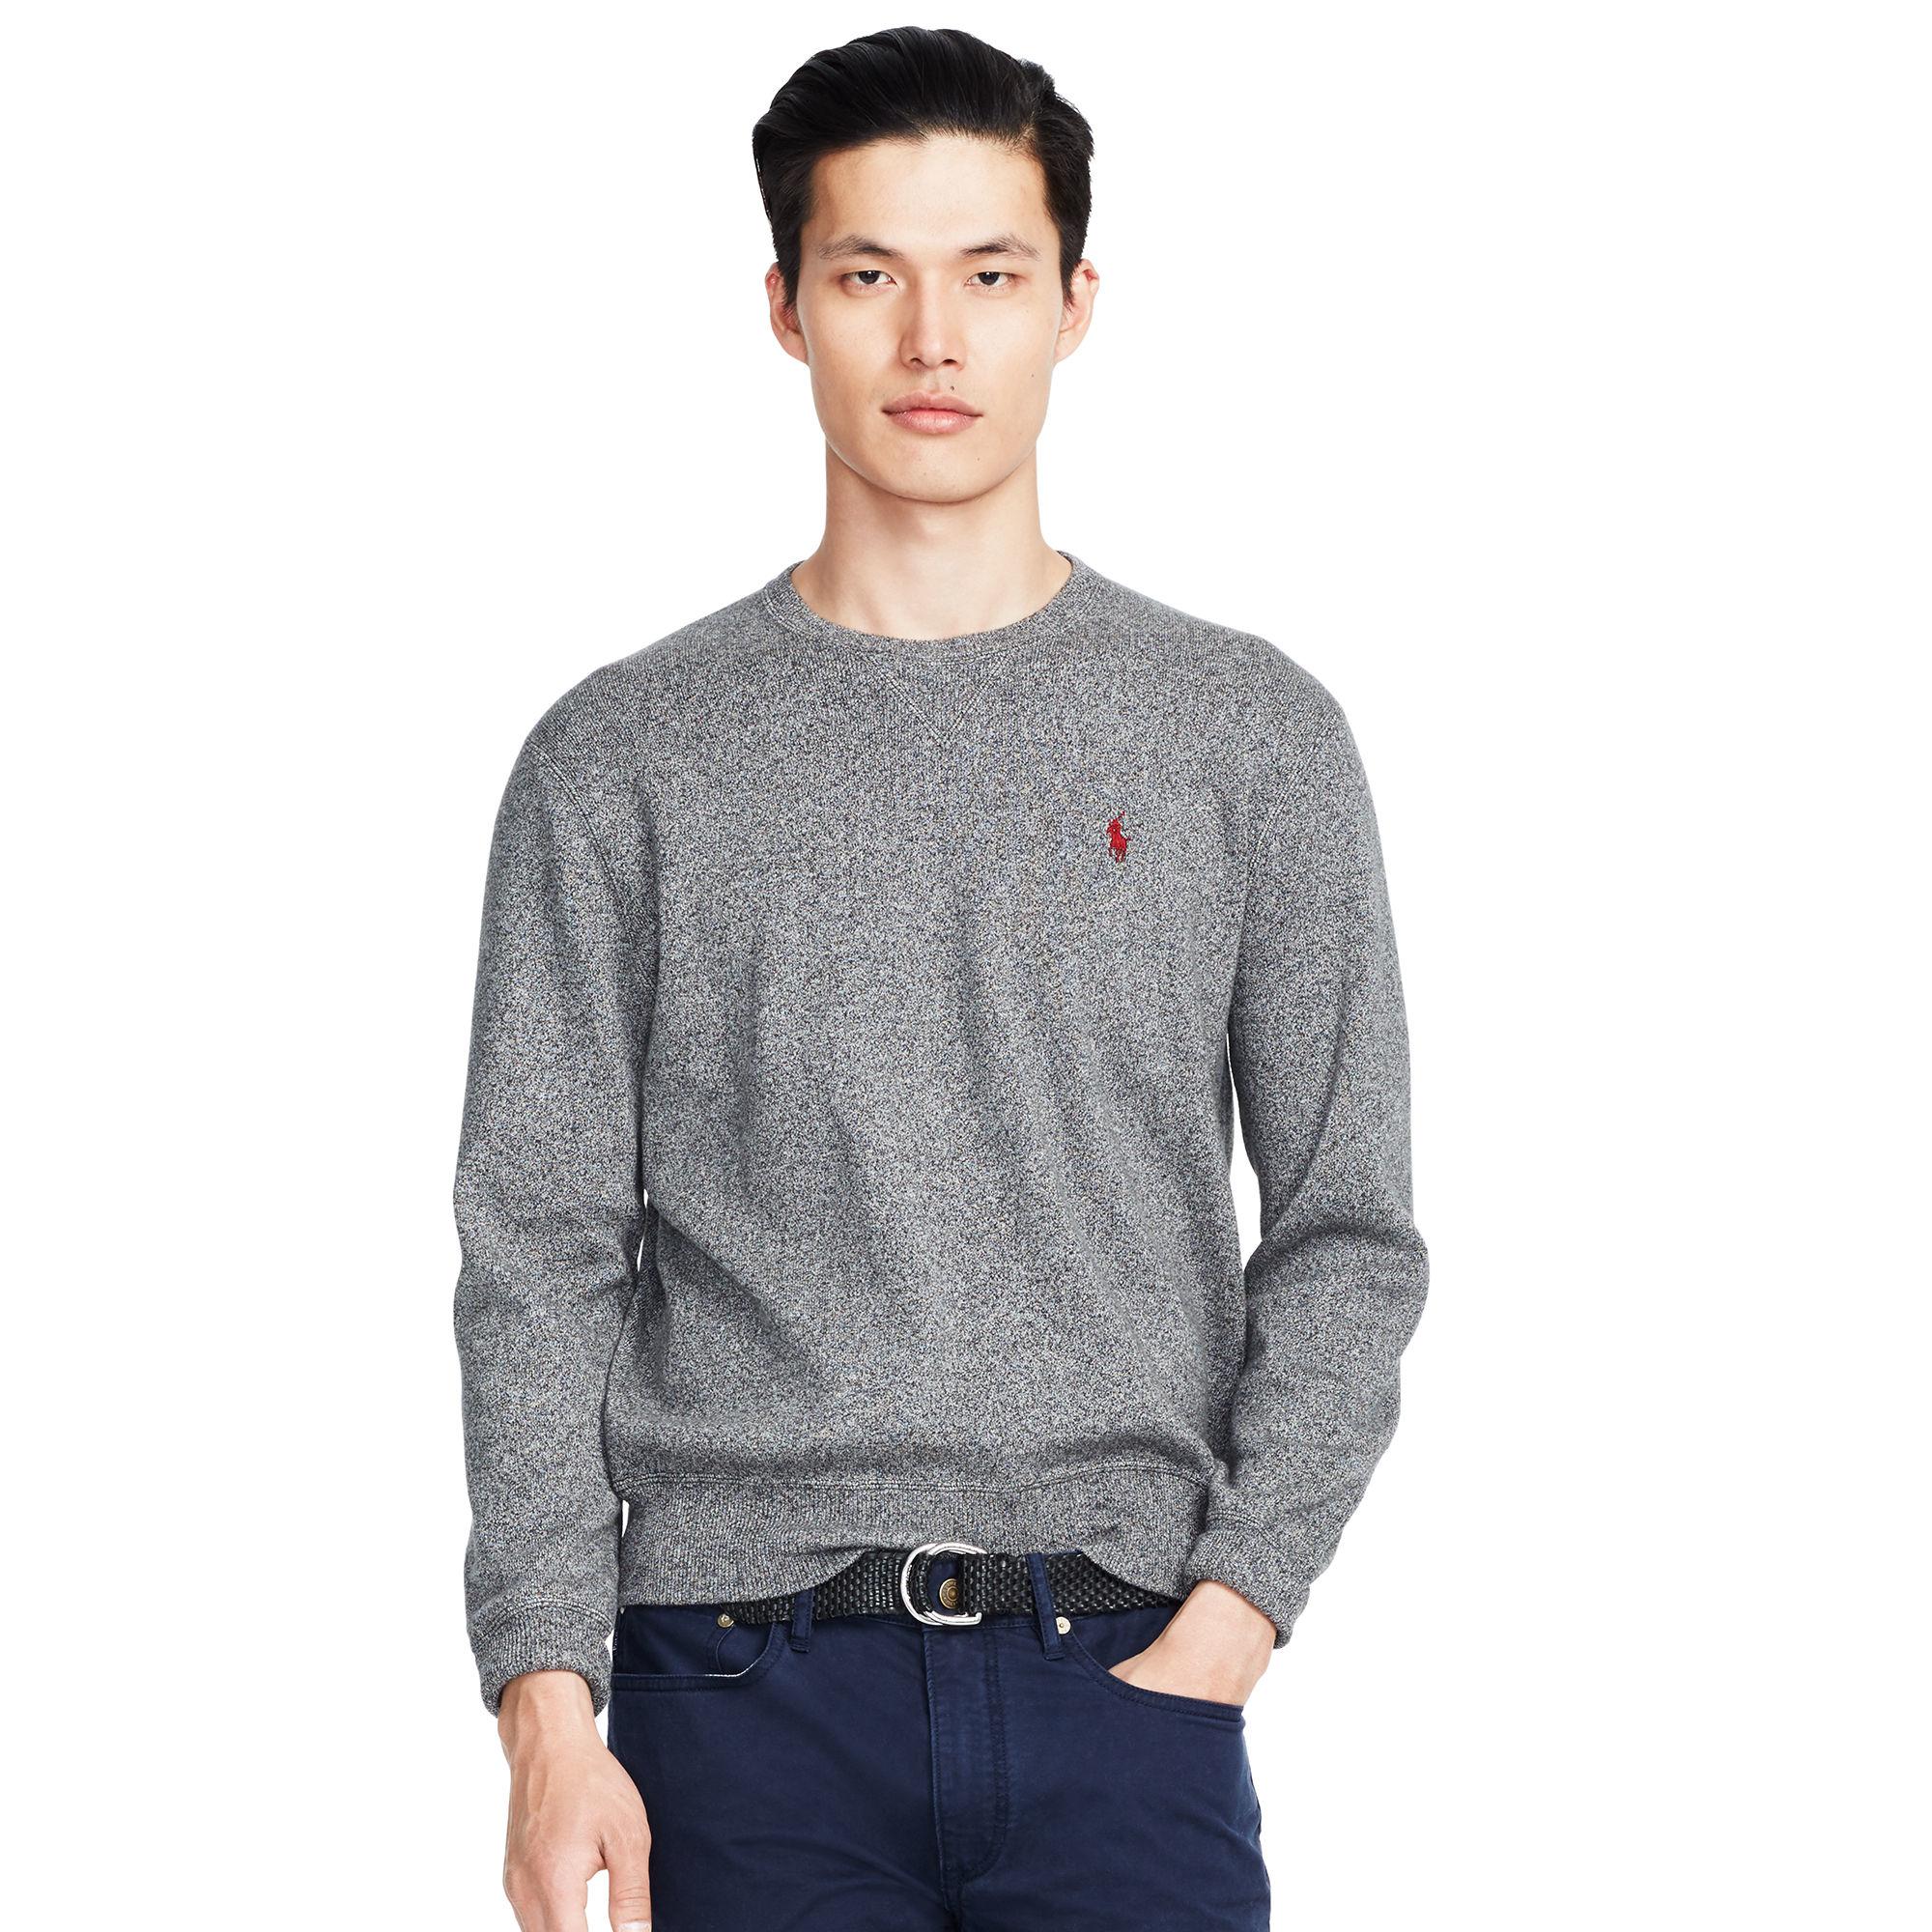 c505736f23d Polo Ralph Lauren Cotton Crewneck Sweater in Black for Men - Lyst